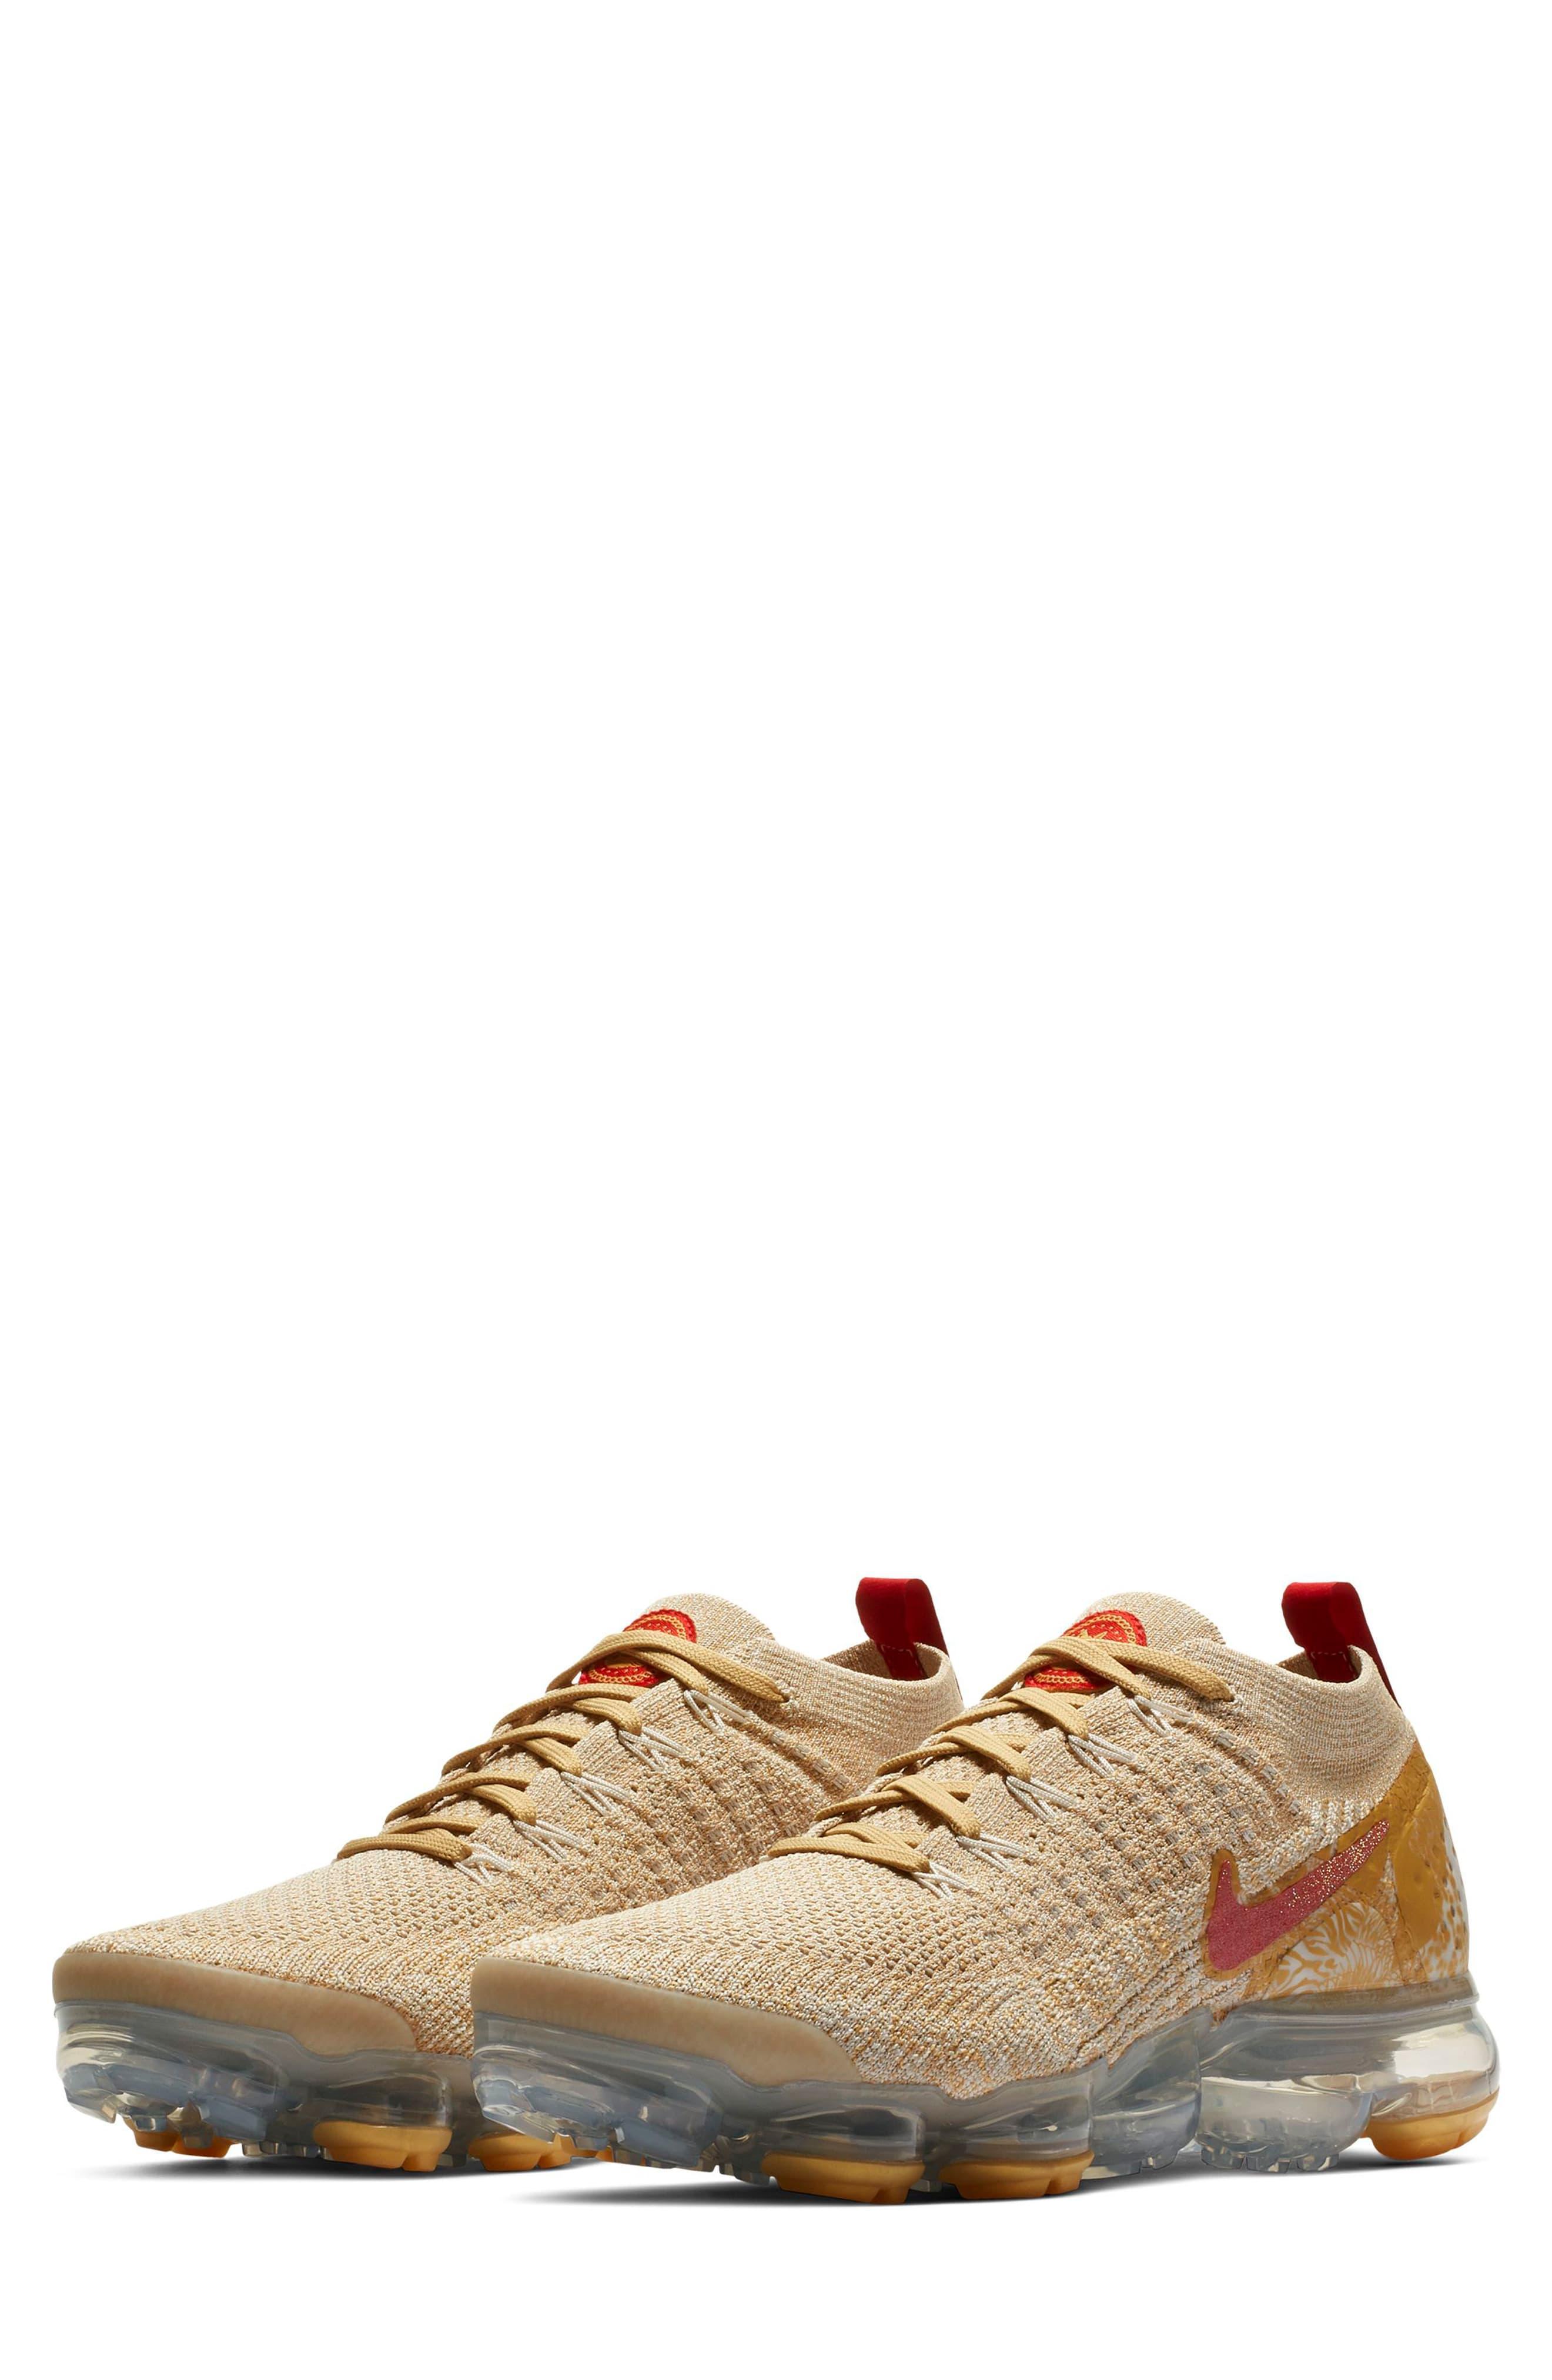 Rascacielos haz radio  Nike Air Vapormax Flyknit 2 Chinese New Year Running Shoe - Lyst